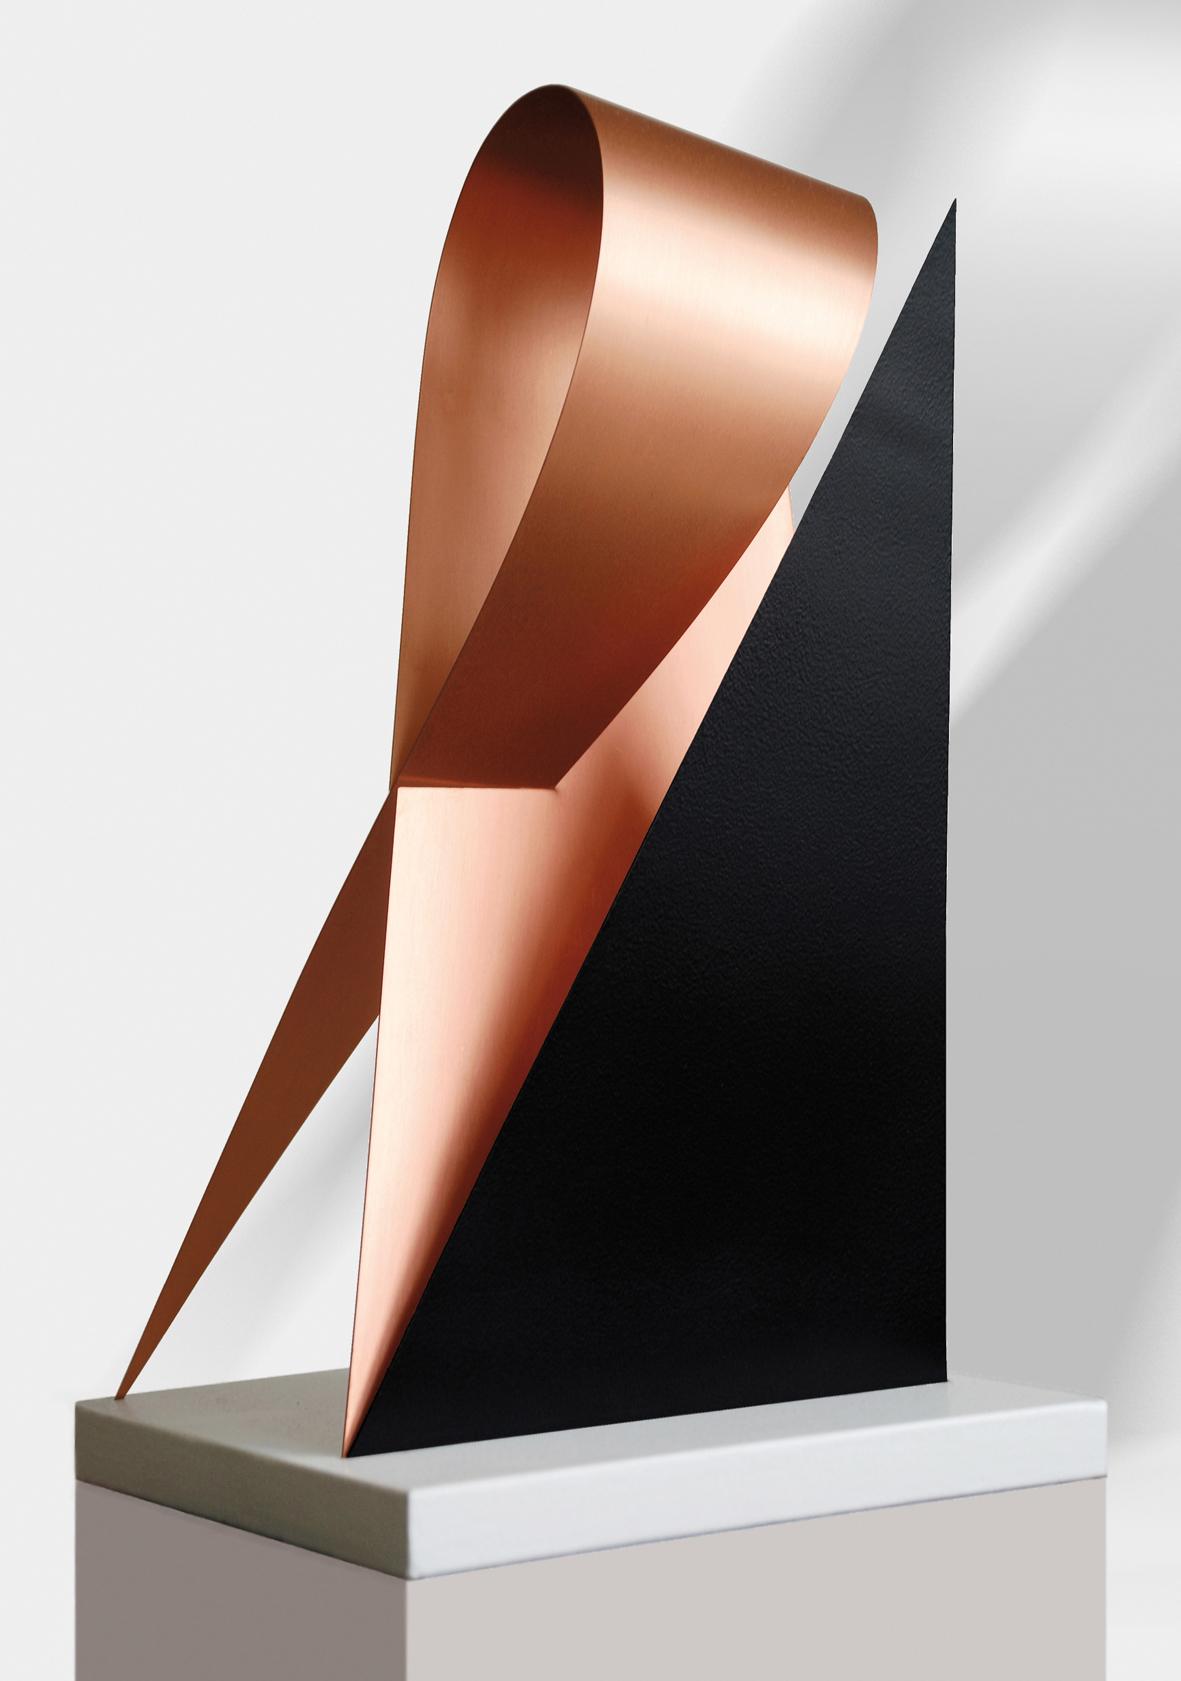 8. motiv, höhe 33 cm, kupfer m. einfärbung